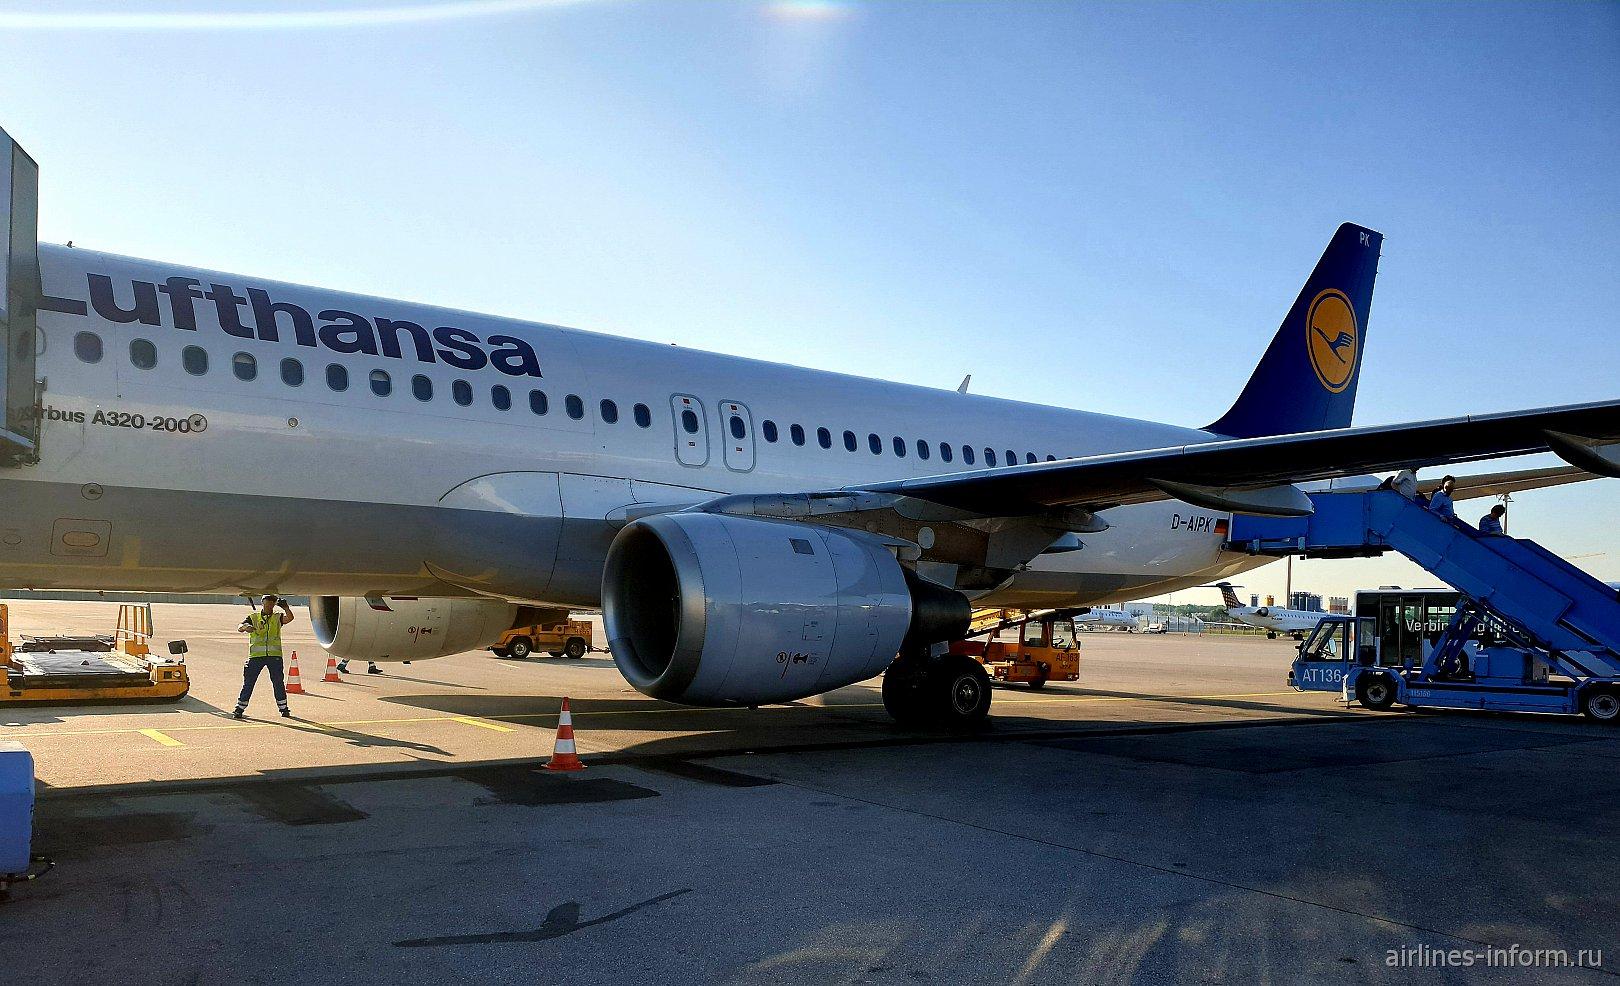 От моря Охотского до моря Адриатического ч.4 Будапешт (BUD)-Мюнхен (MUC). а/к Lufthansa Airbus A320-211 (бизнес класс).